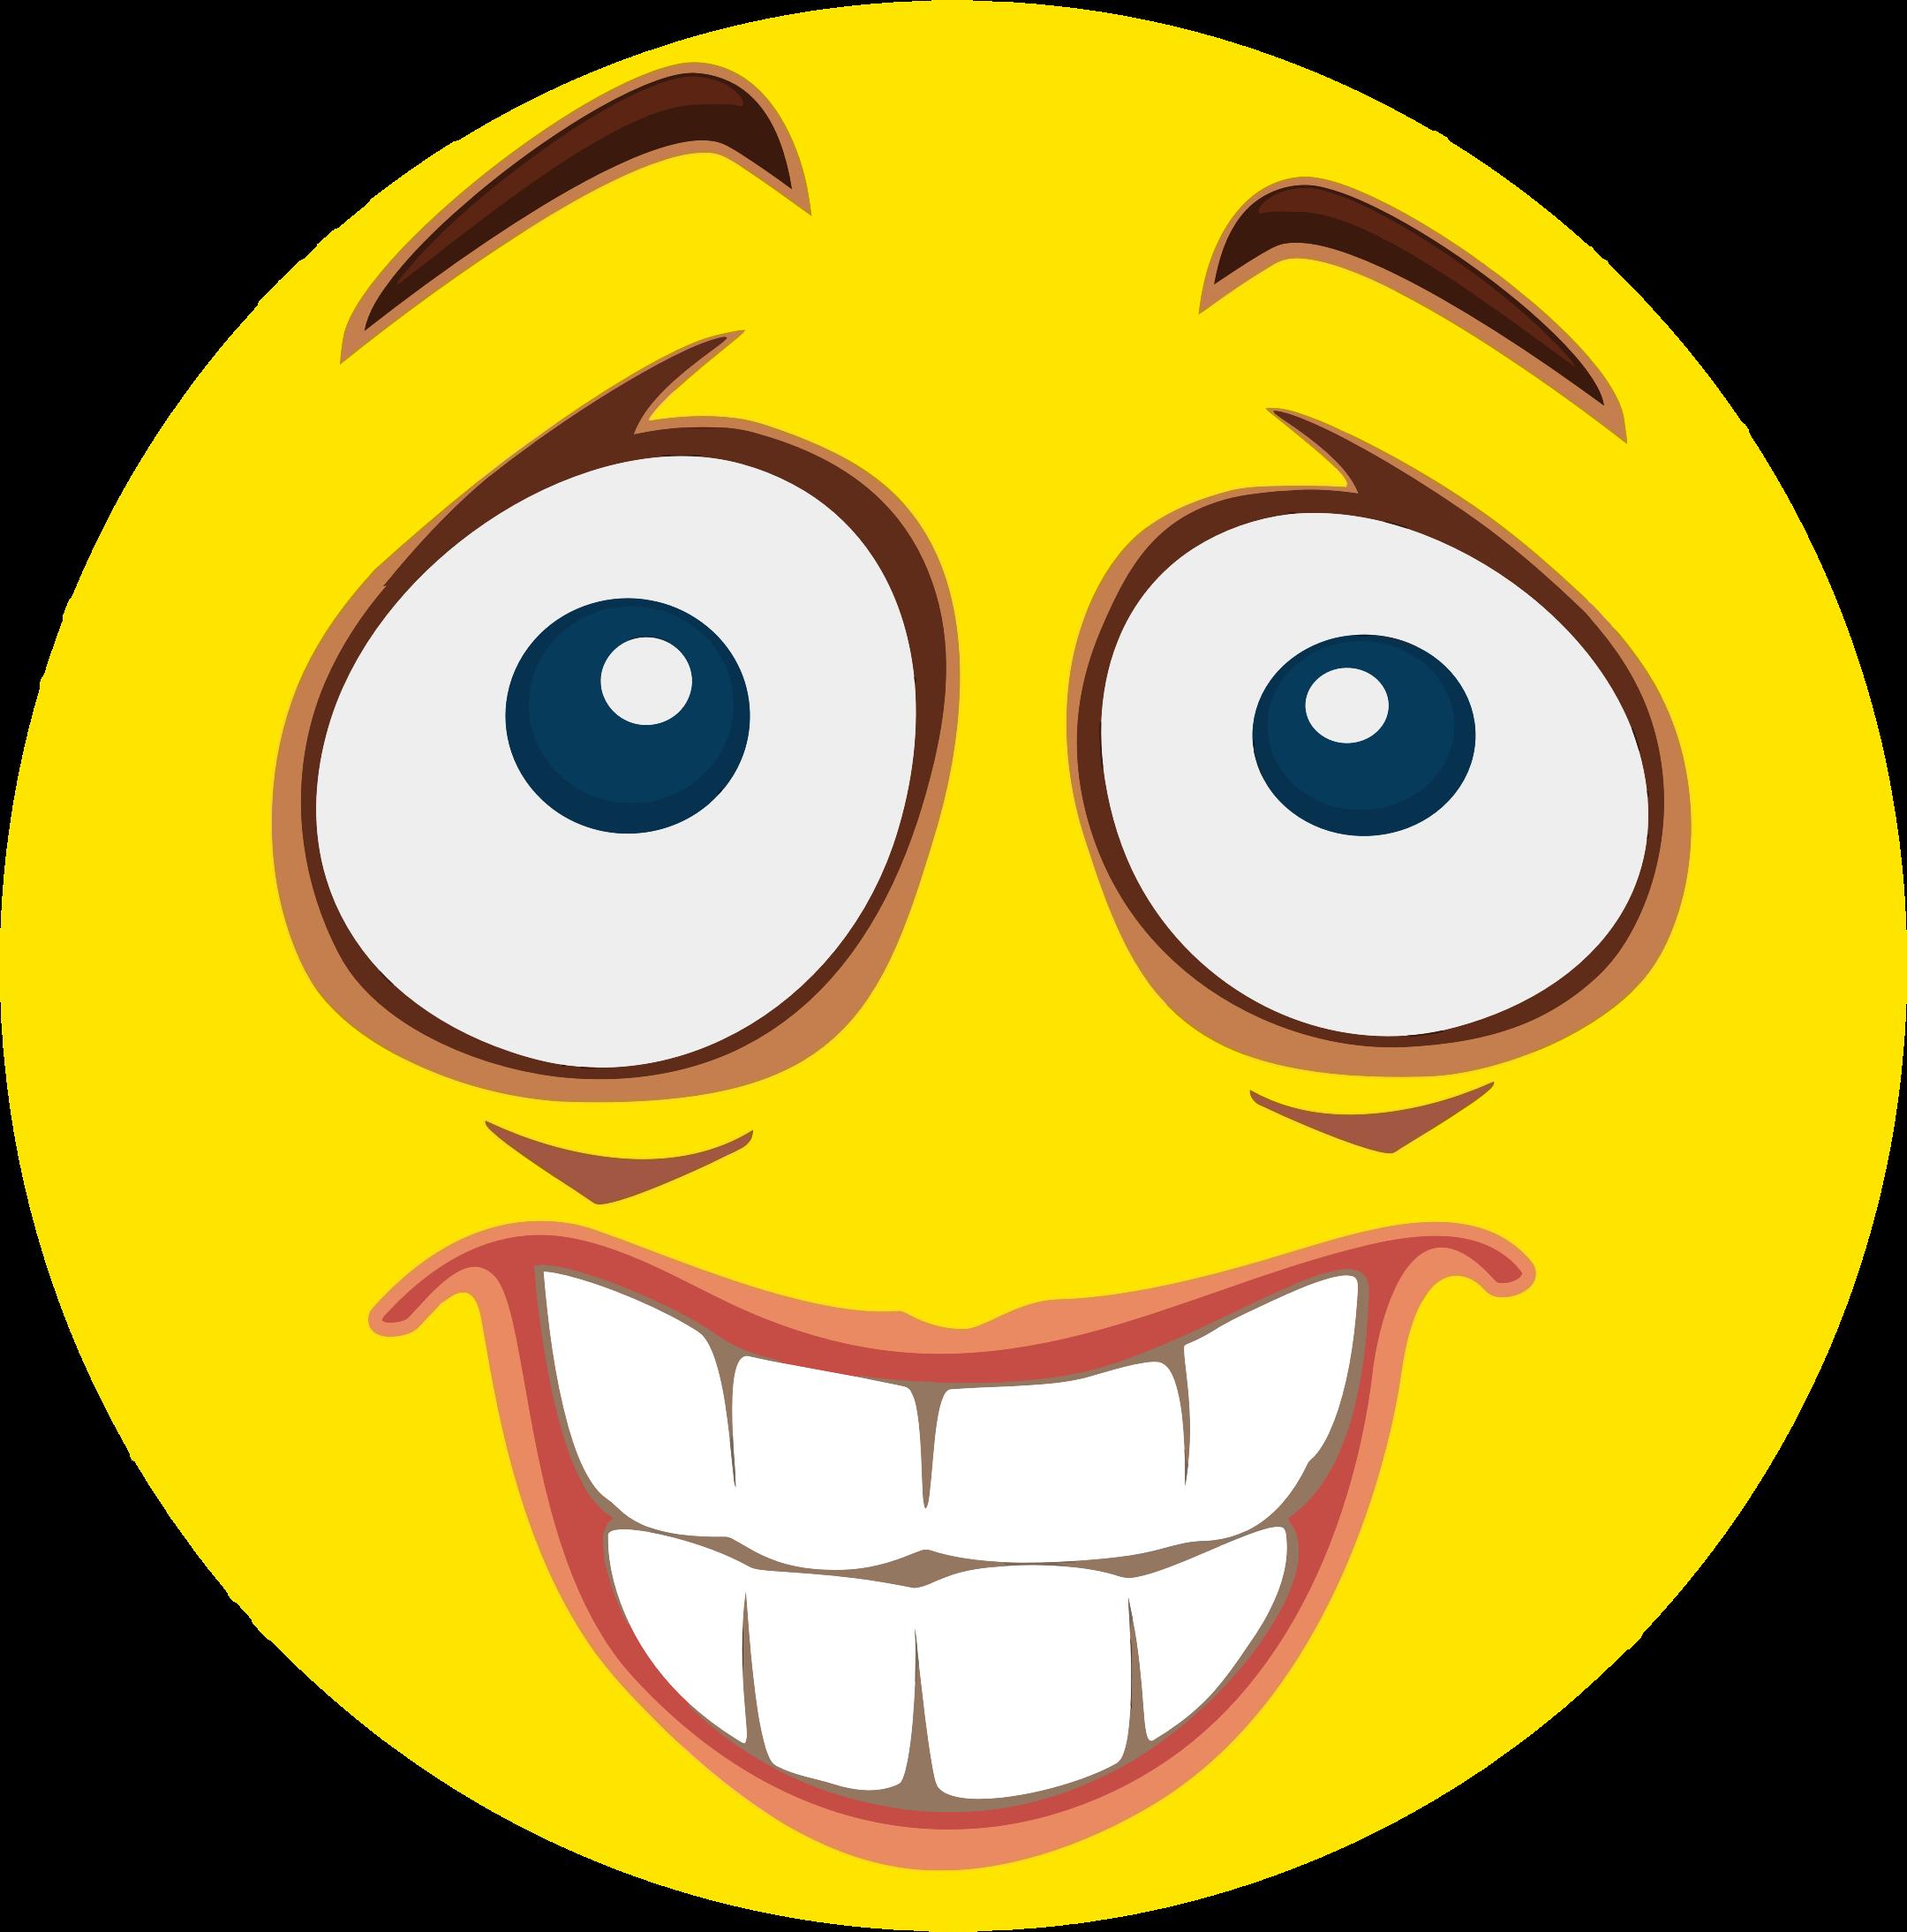 2160x2188 Smileys Clipart Nervous